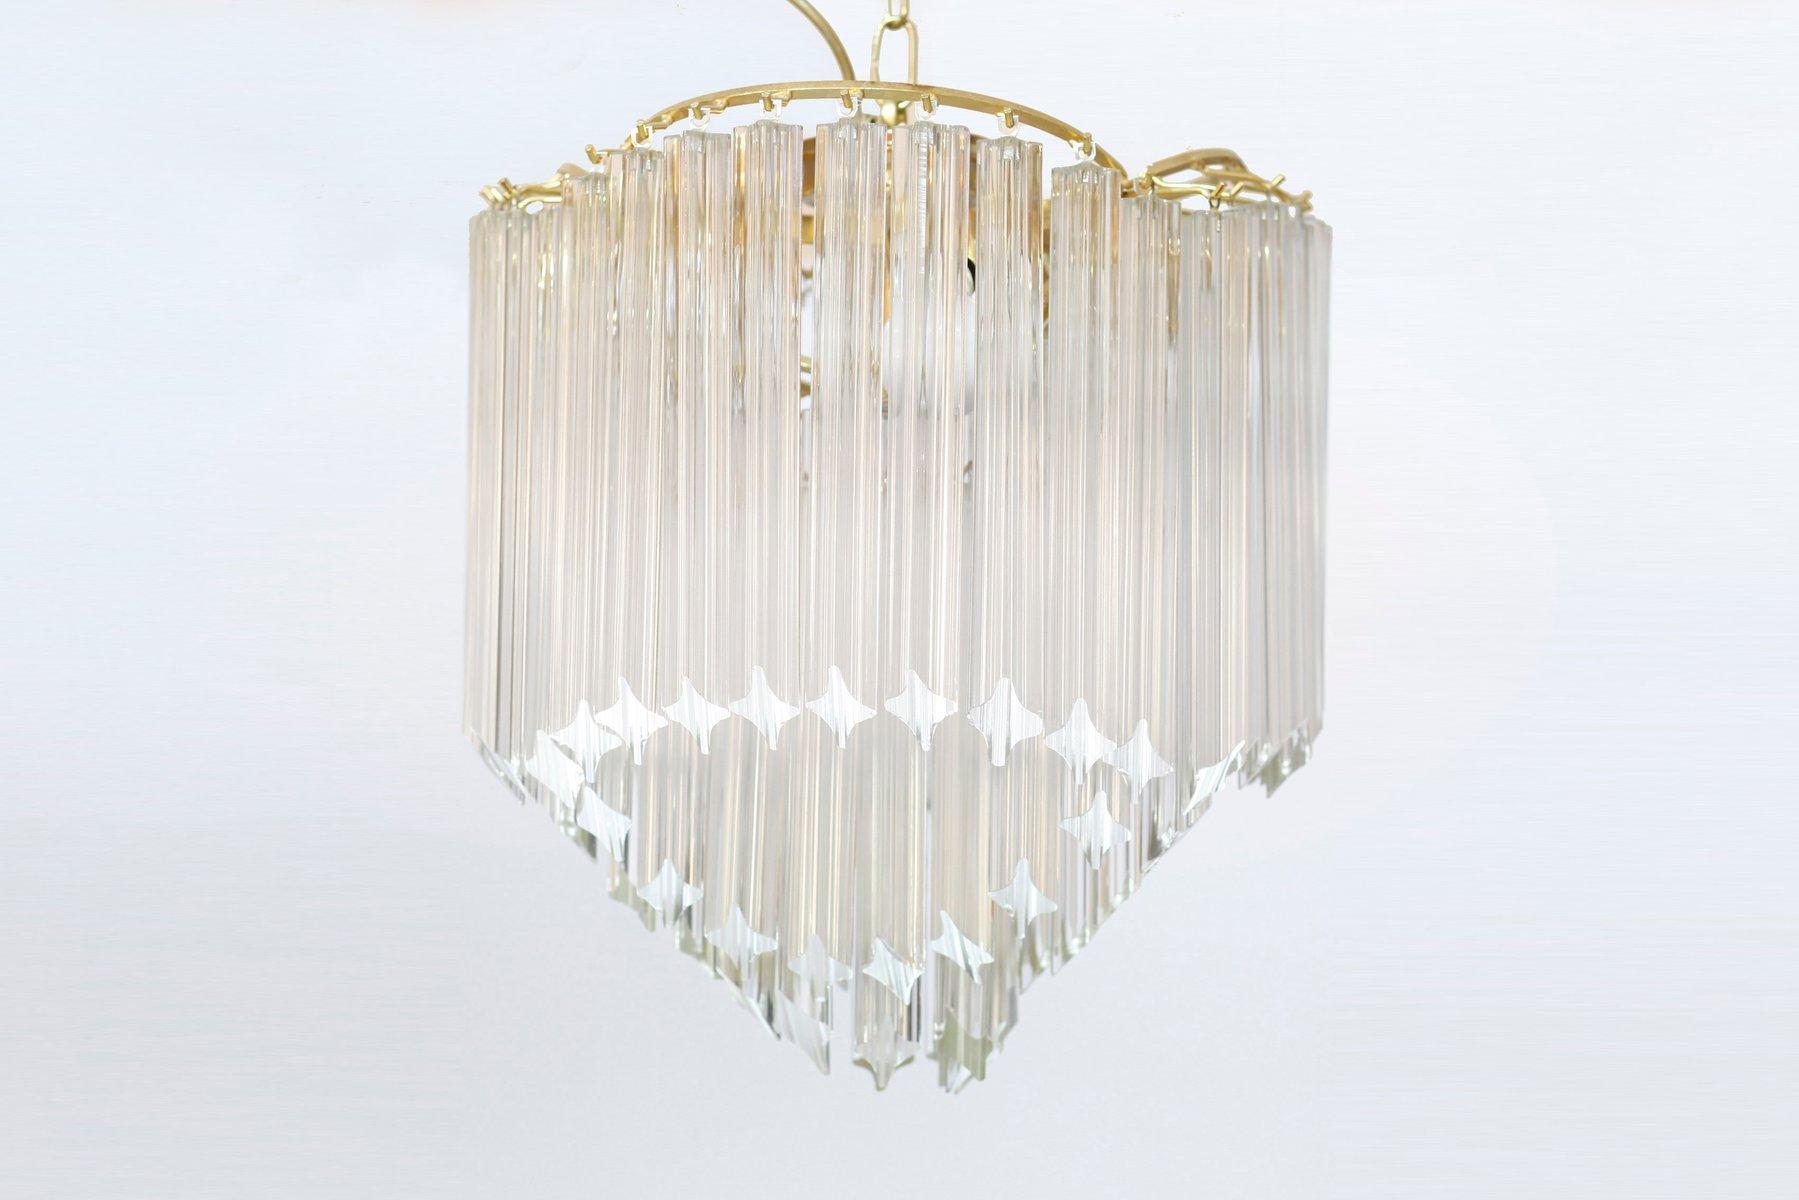 Mid century modern murano glass chandelier from venini 1970s for mid century modern murano glass chandelier from venini 1970s mozeypictures Gallery